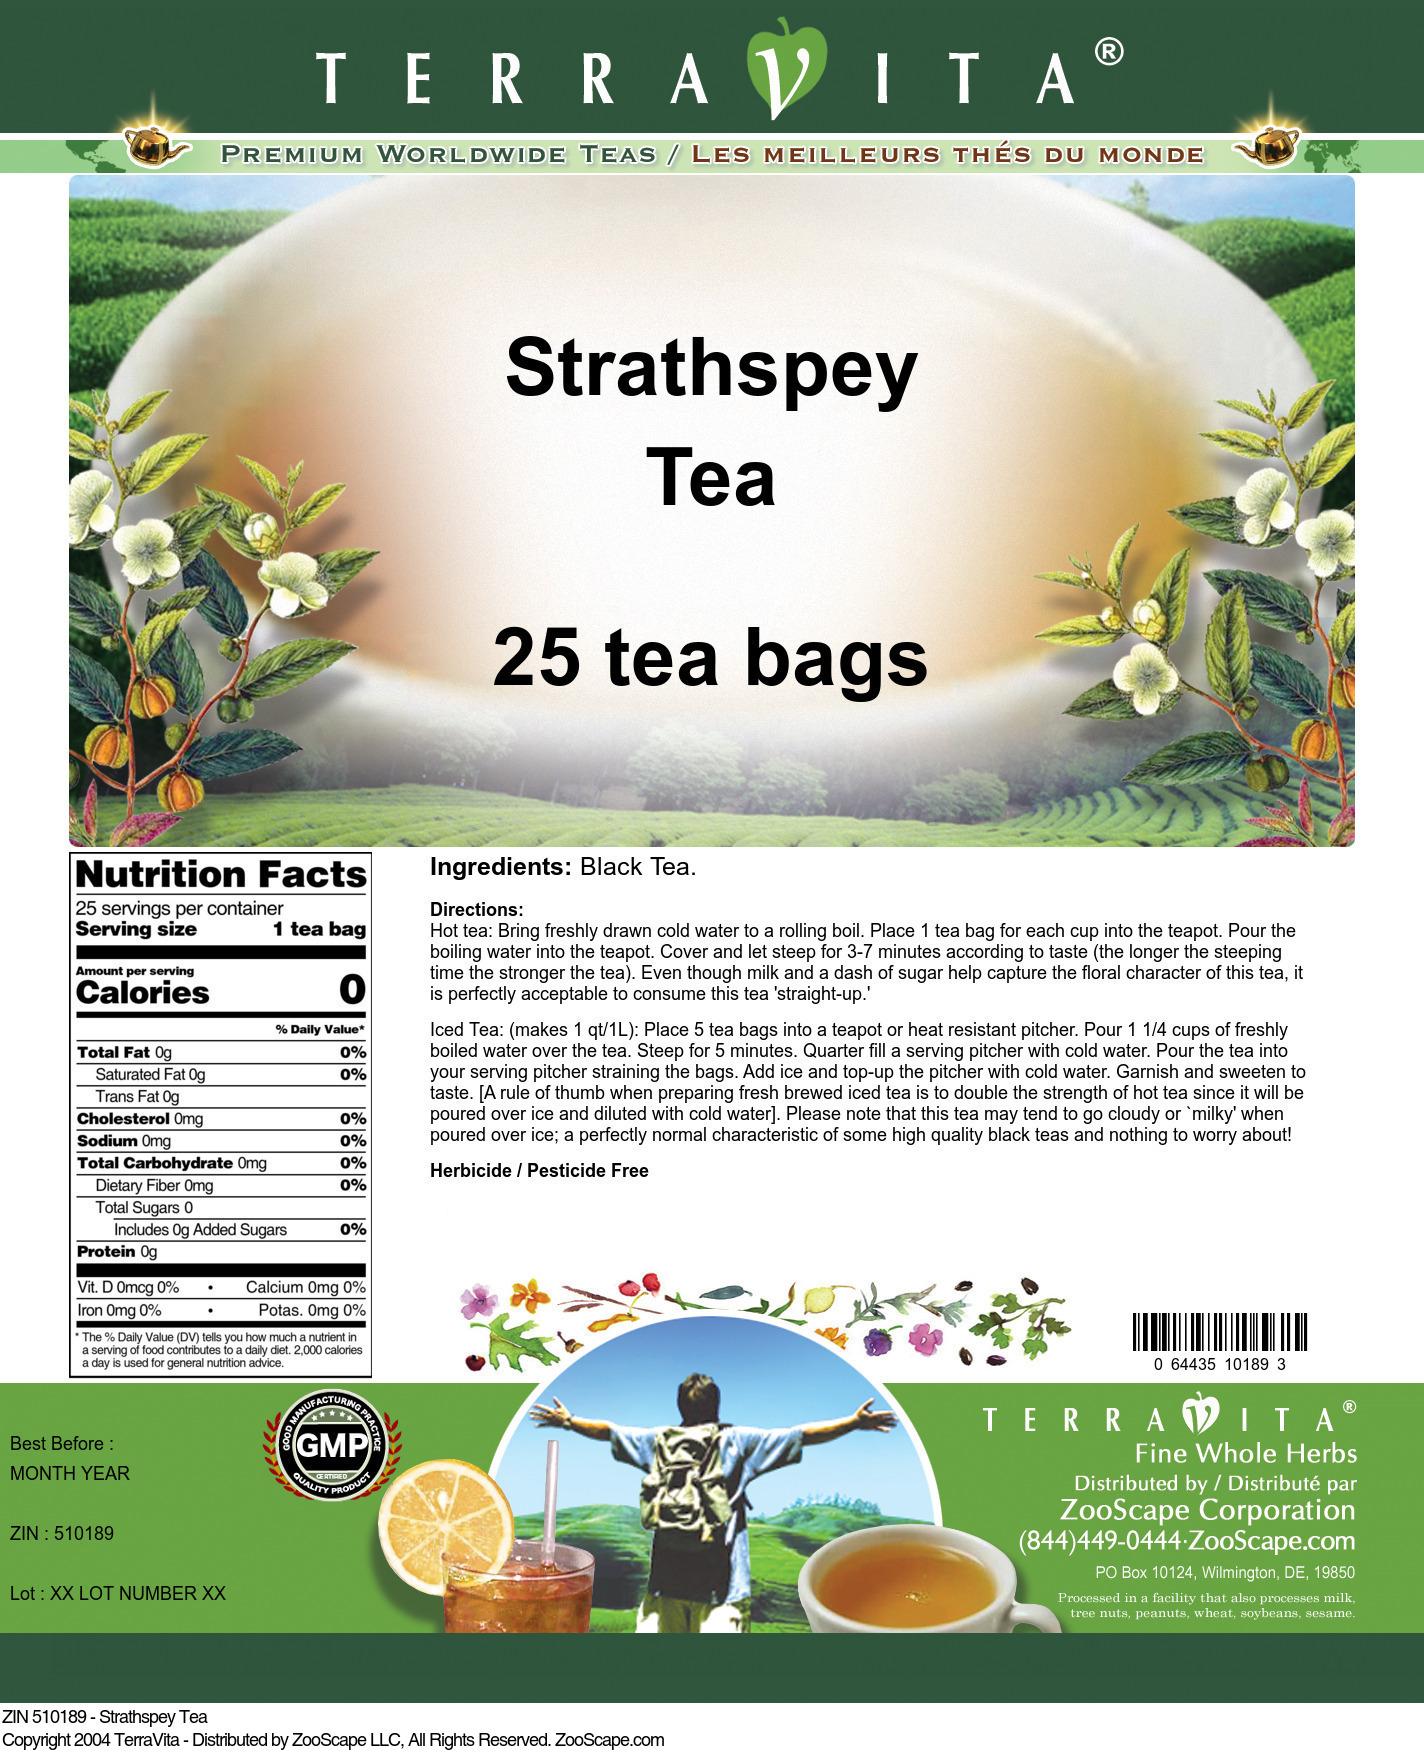 Strathspey Tea